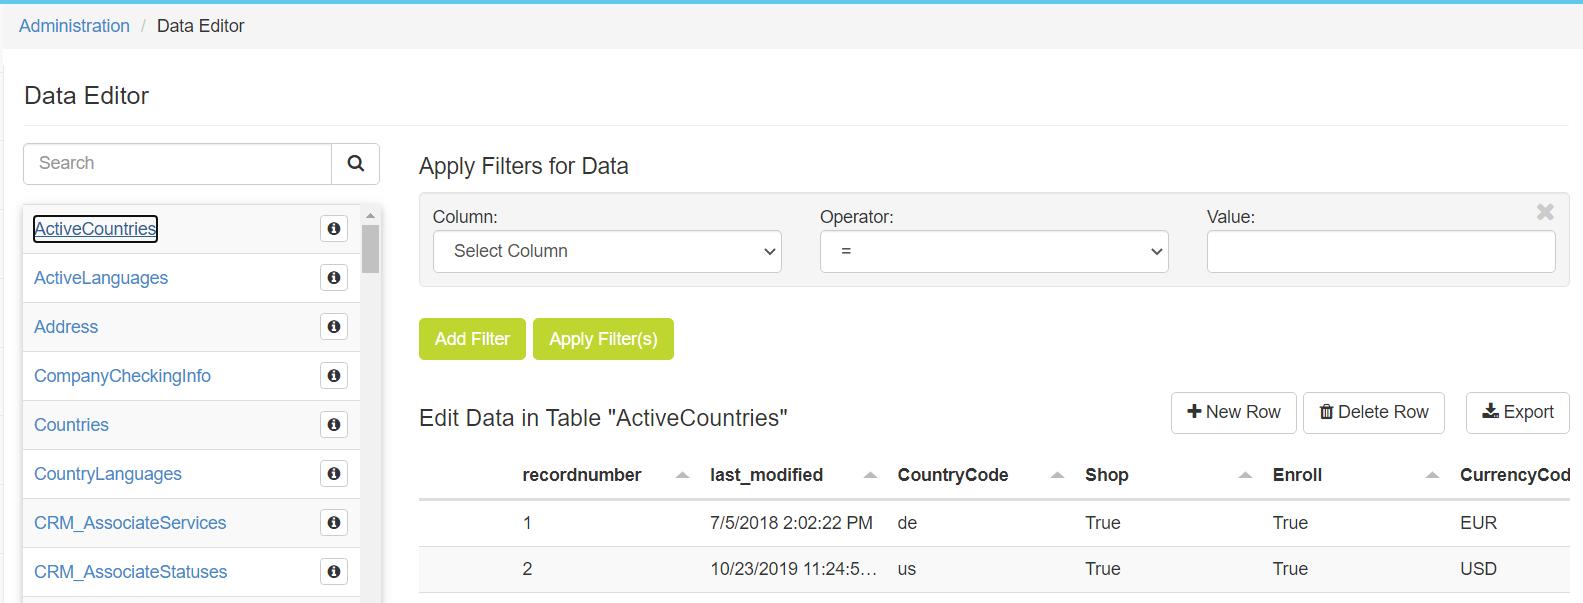 Data Editor page